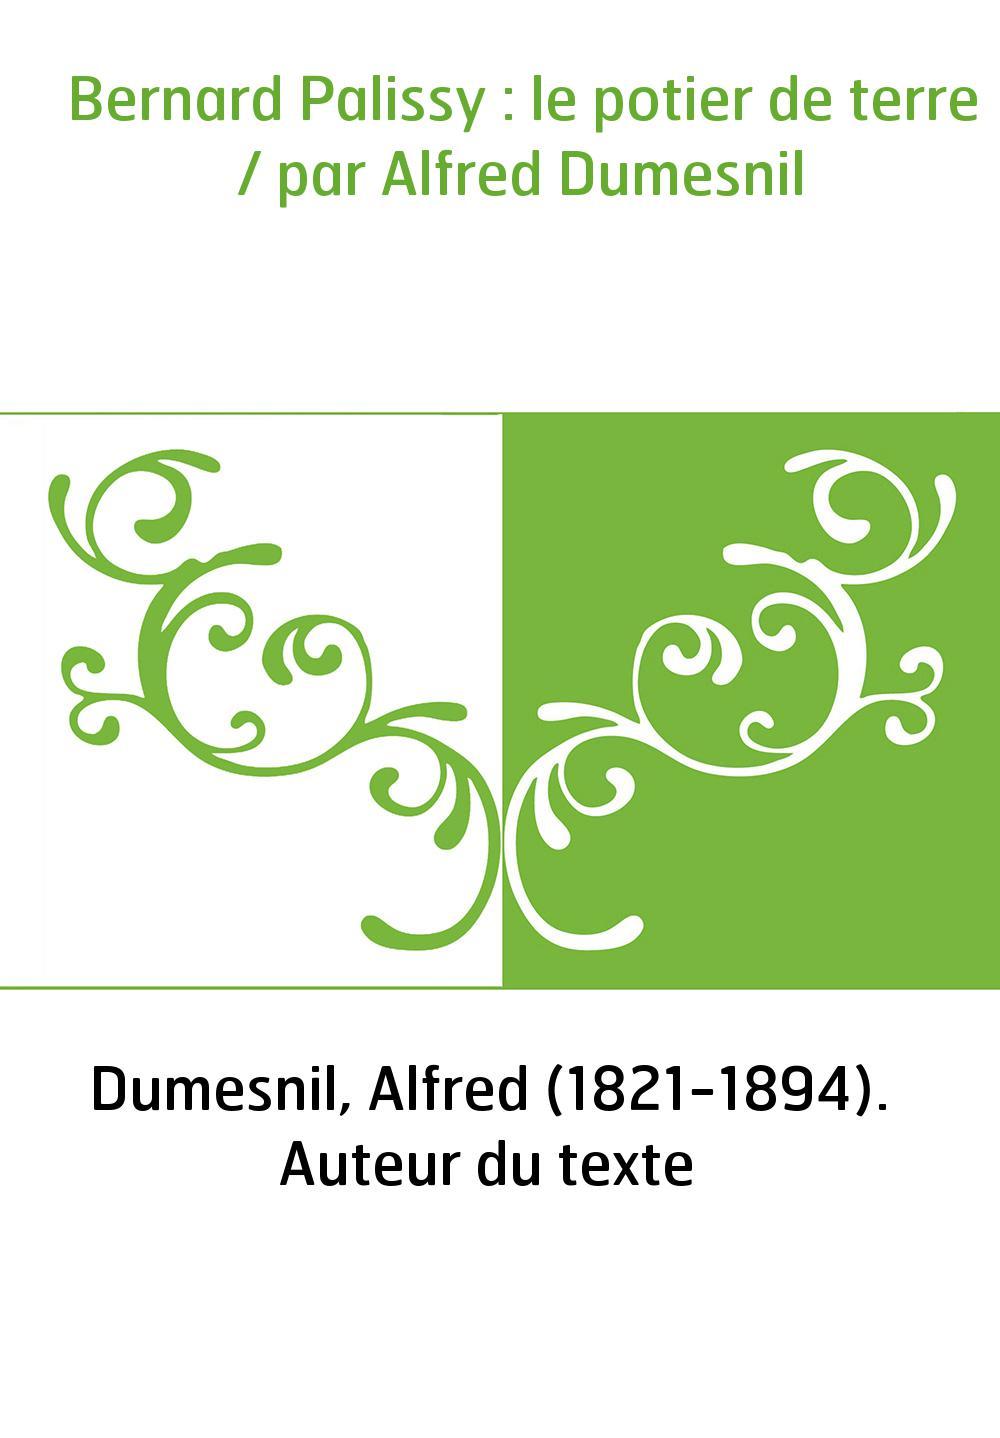 Bernard Palissy : le potier de terre / par Alfred Dumesnil